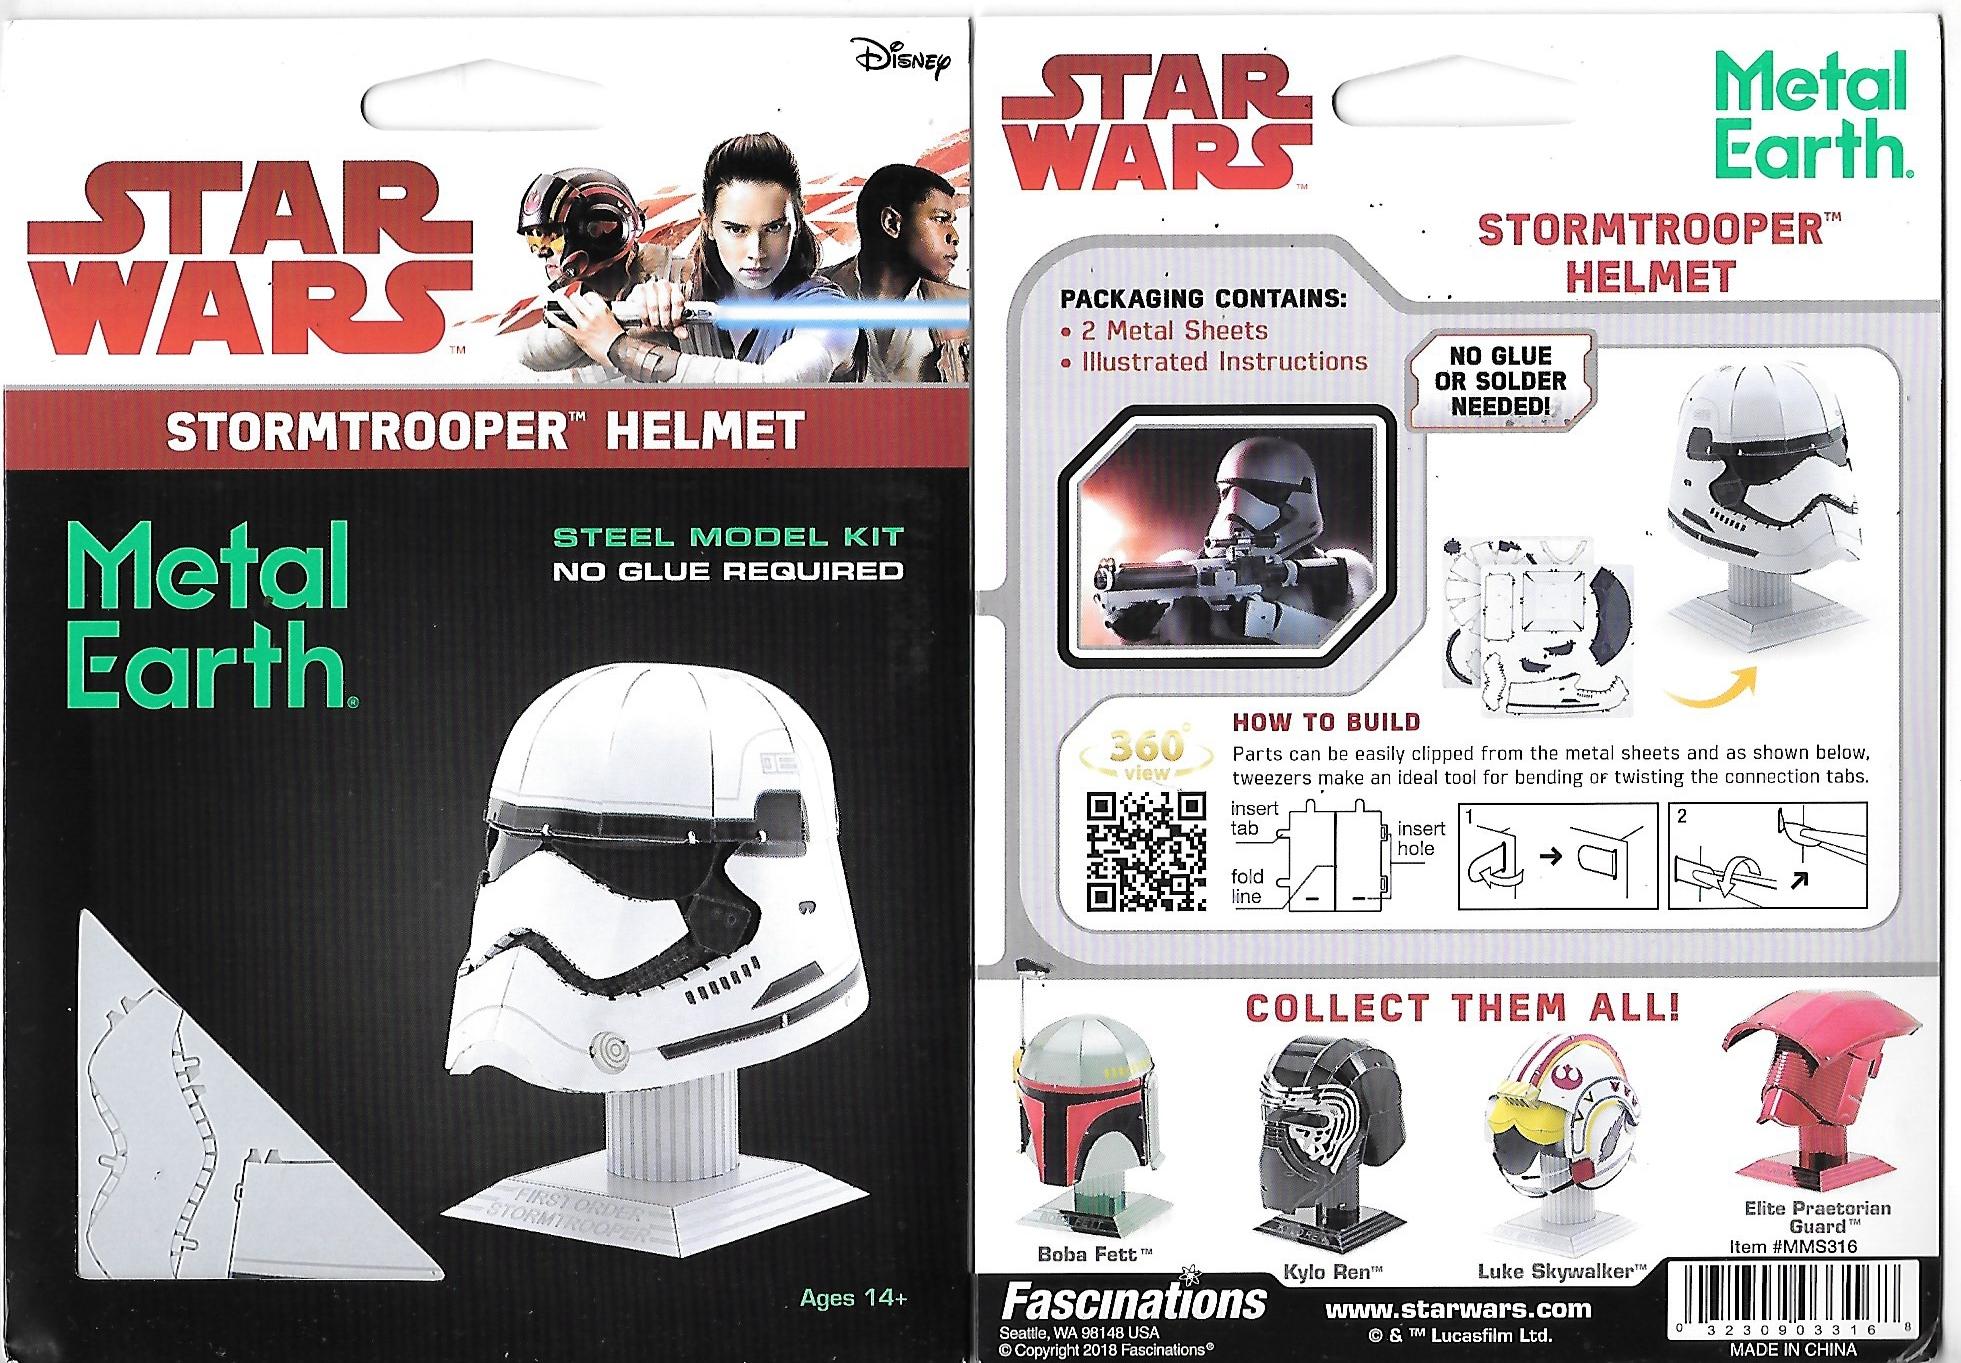 079cb31ca Star Wars StormTrooper Helmet Metal Earth 3-D Laser Cut Steel Model Kit   MMS316